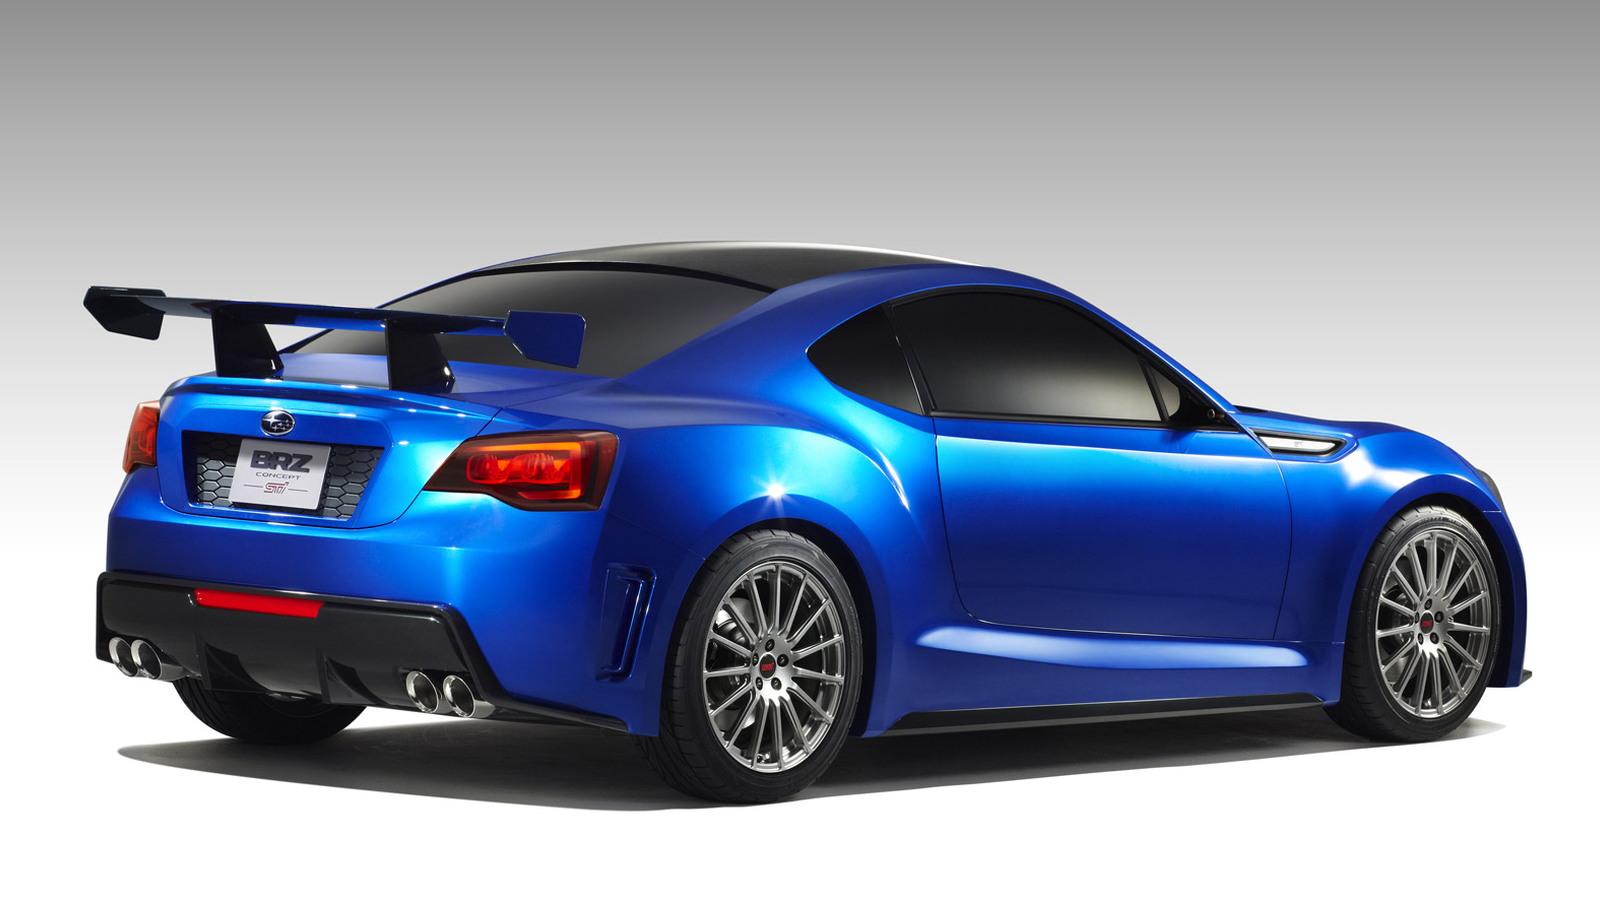 2011 Subaru BRZ Concept - STI